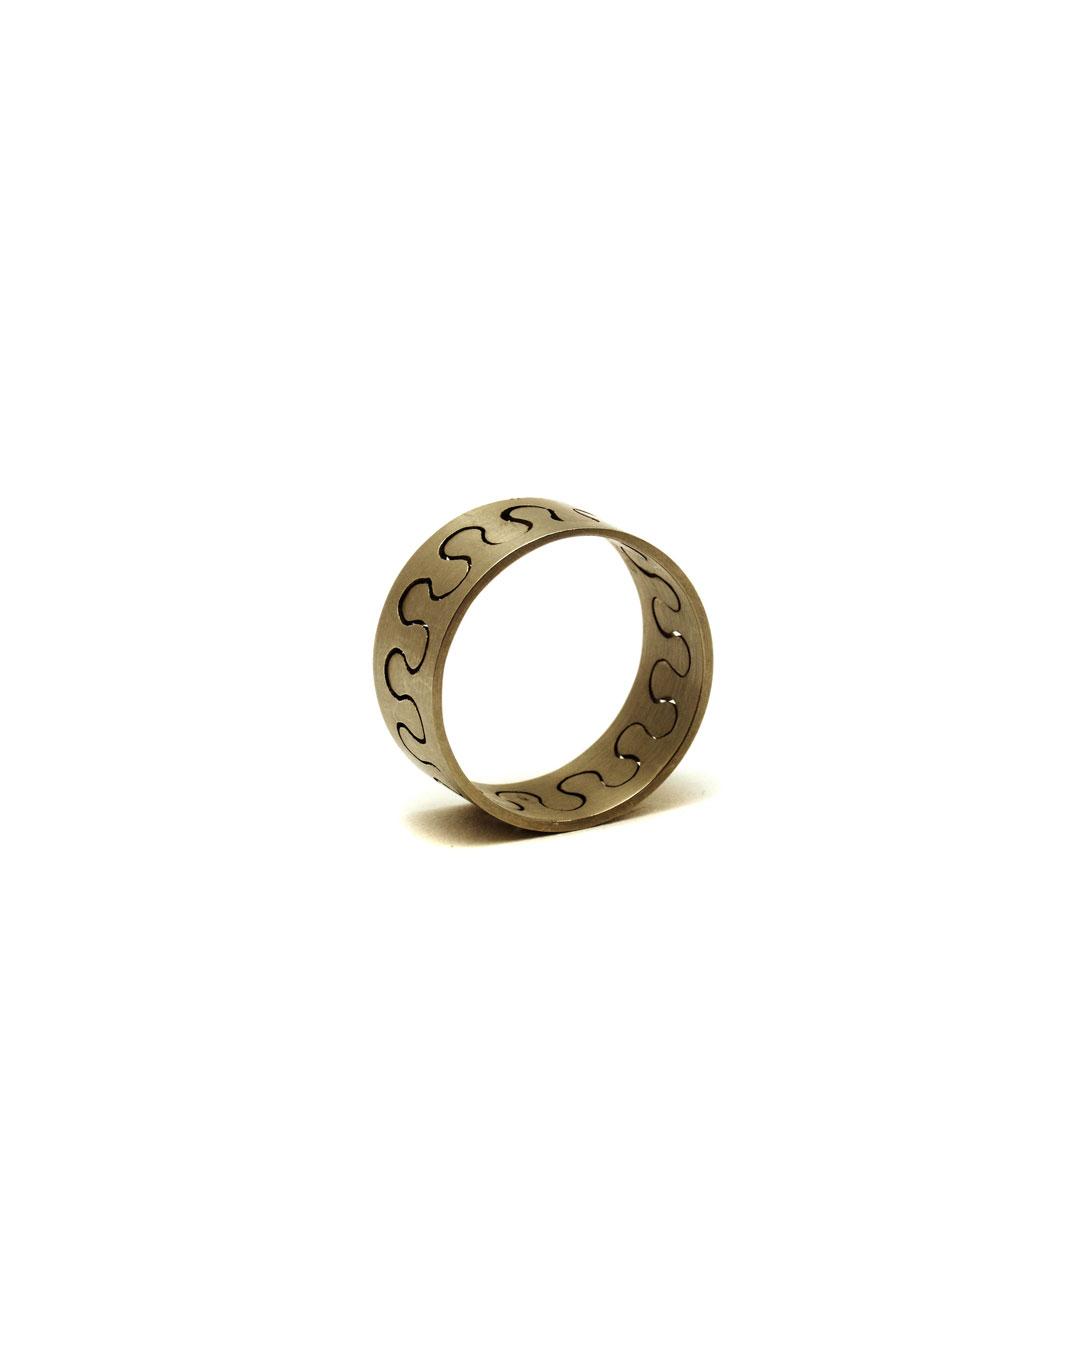 Herman Hermsen, Meanderring, 1995, ring; 18ct gold, ø 20 mm, €1100